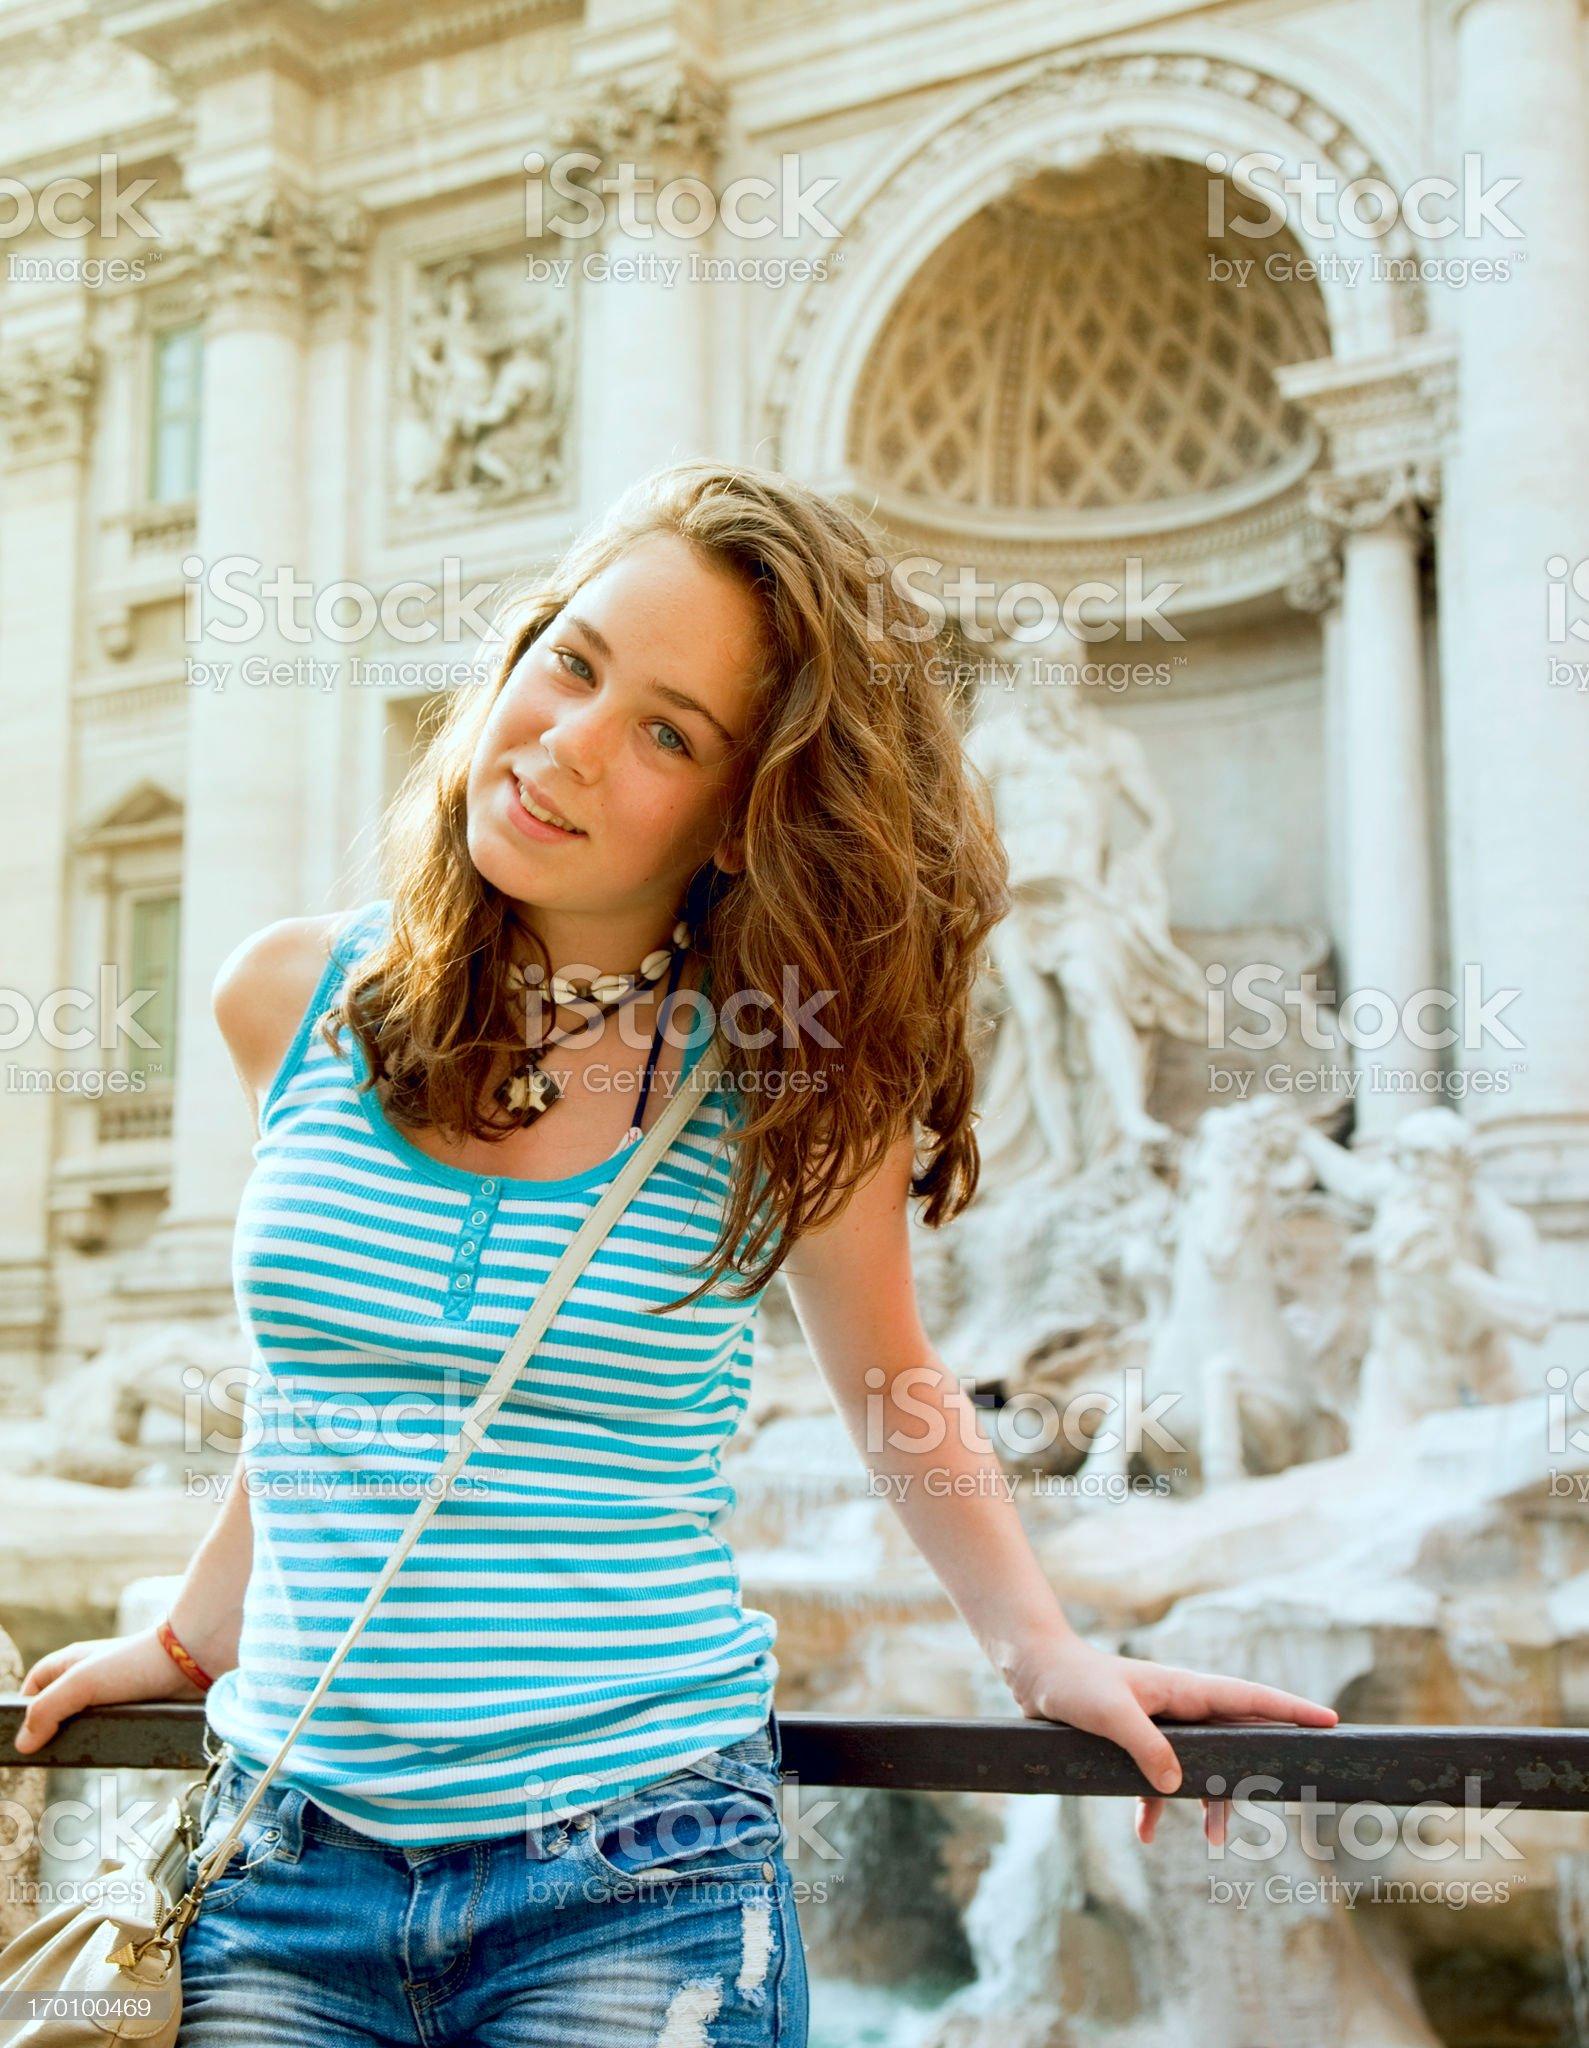 Teen tourist at Fontana de Trevi royalty-free stock photo